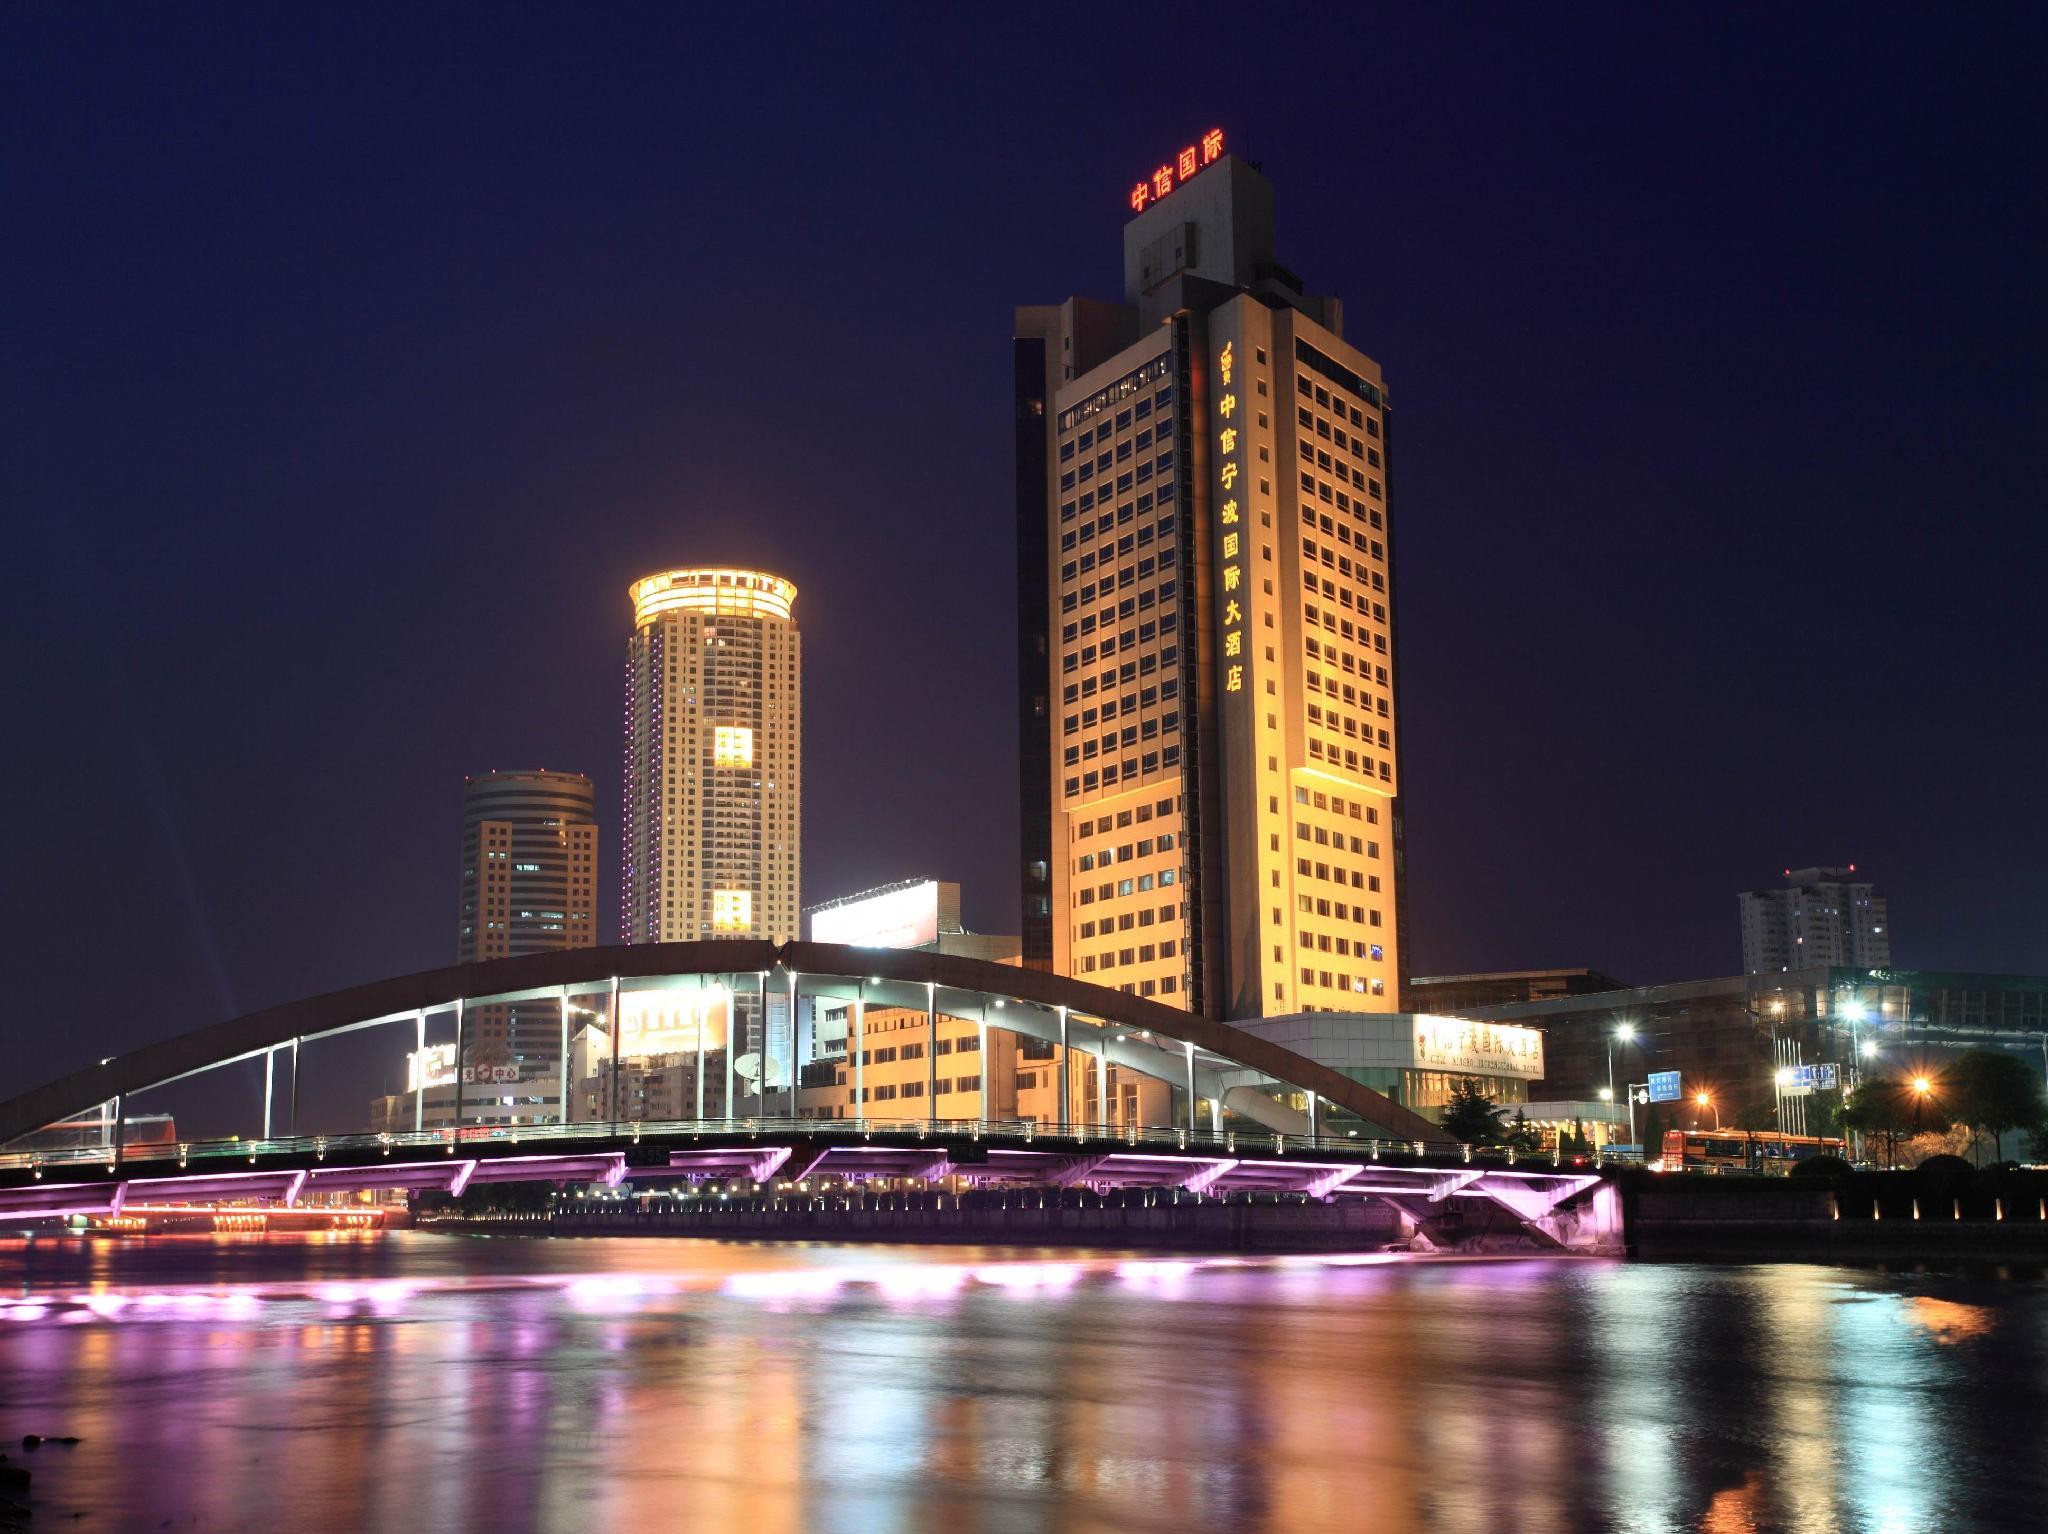 Ningbo CITIC International Hotel - Ningbo